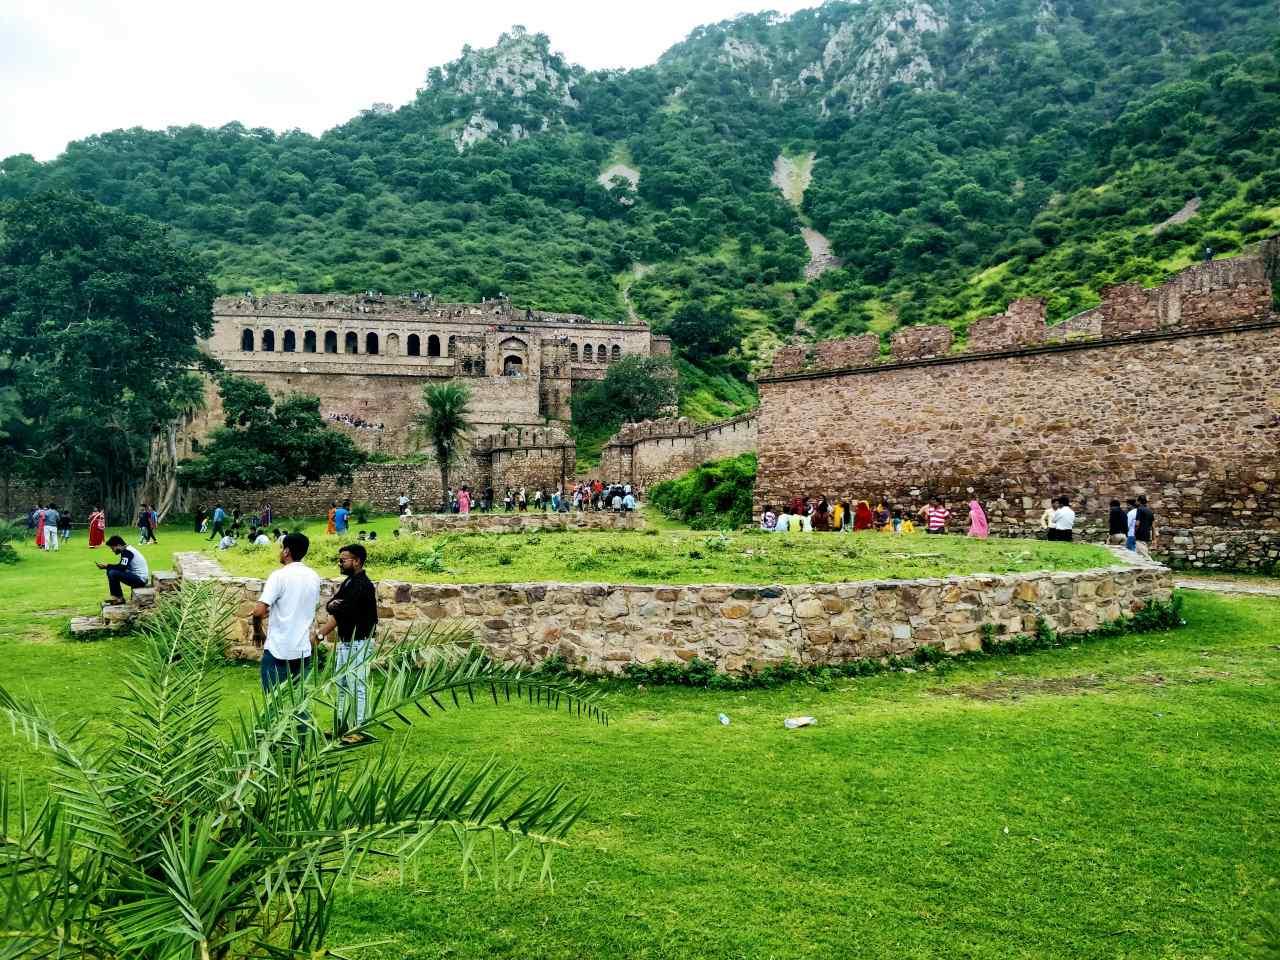 Bhan Garh Fort, Rajasthan